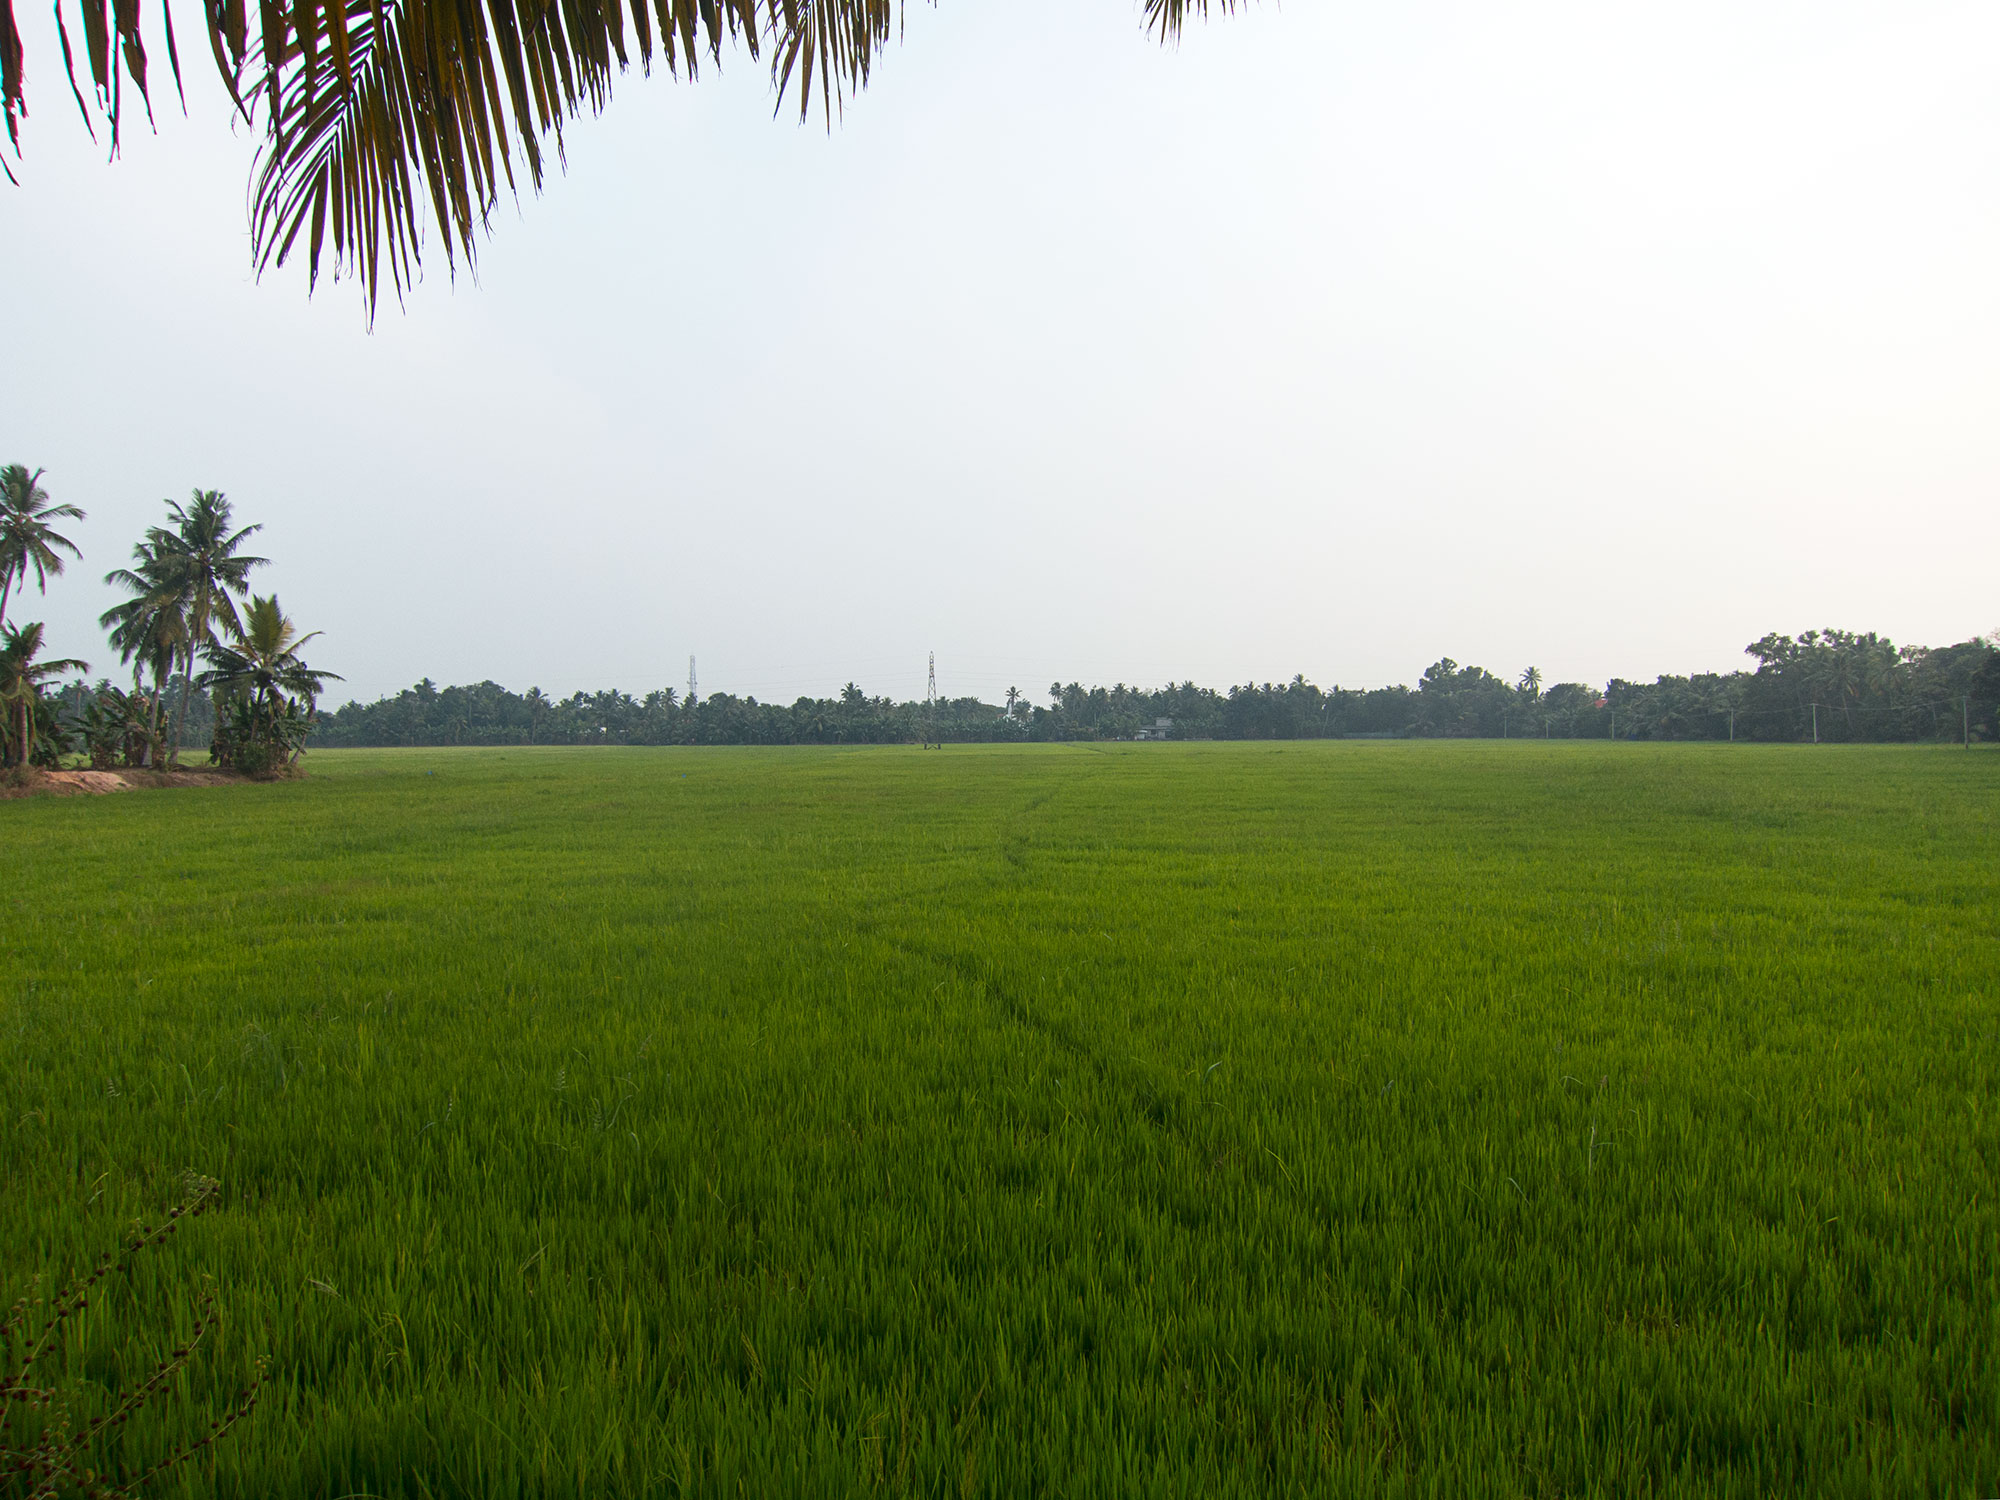 Rice paddy.